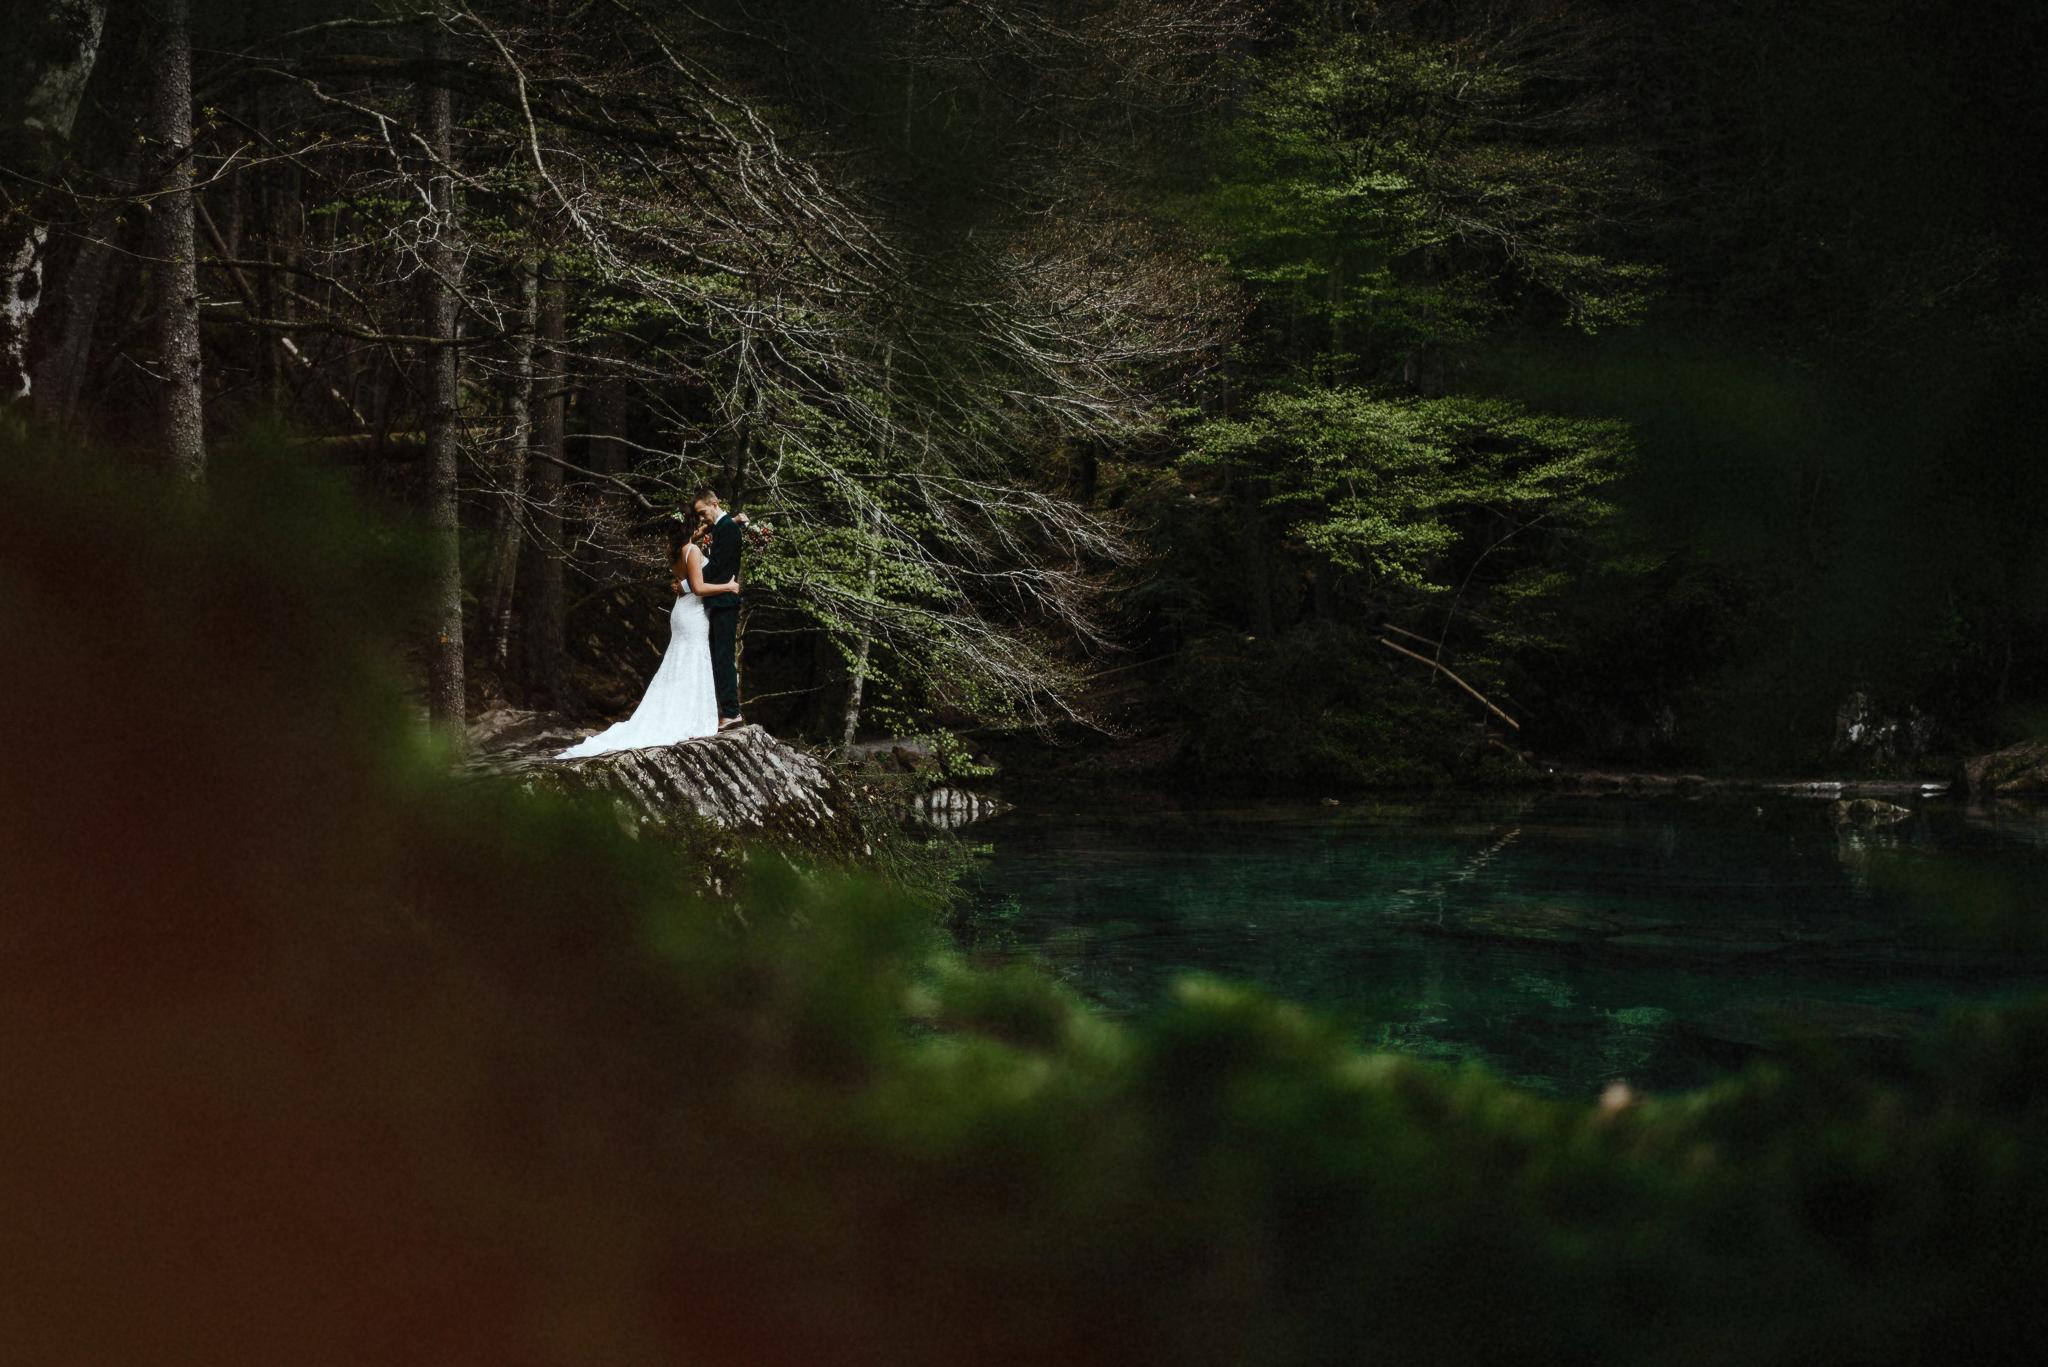 Lake Blausee wedding by Stefan Hellberg Photography